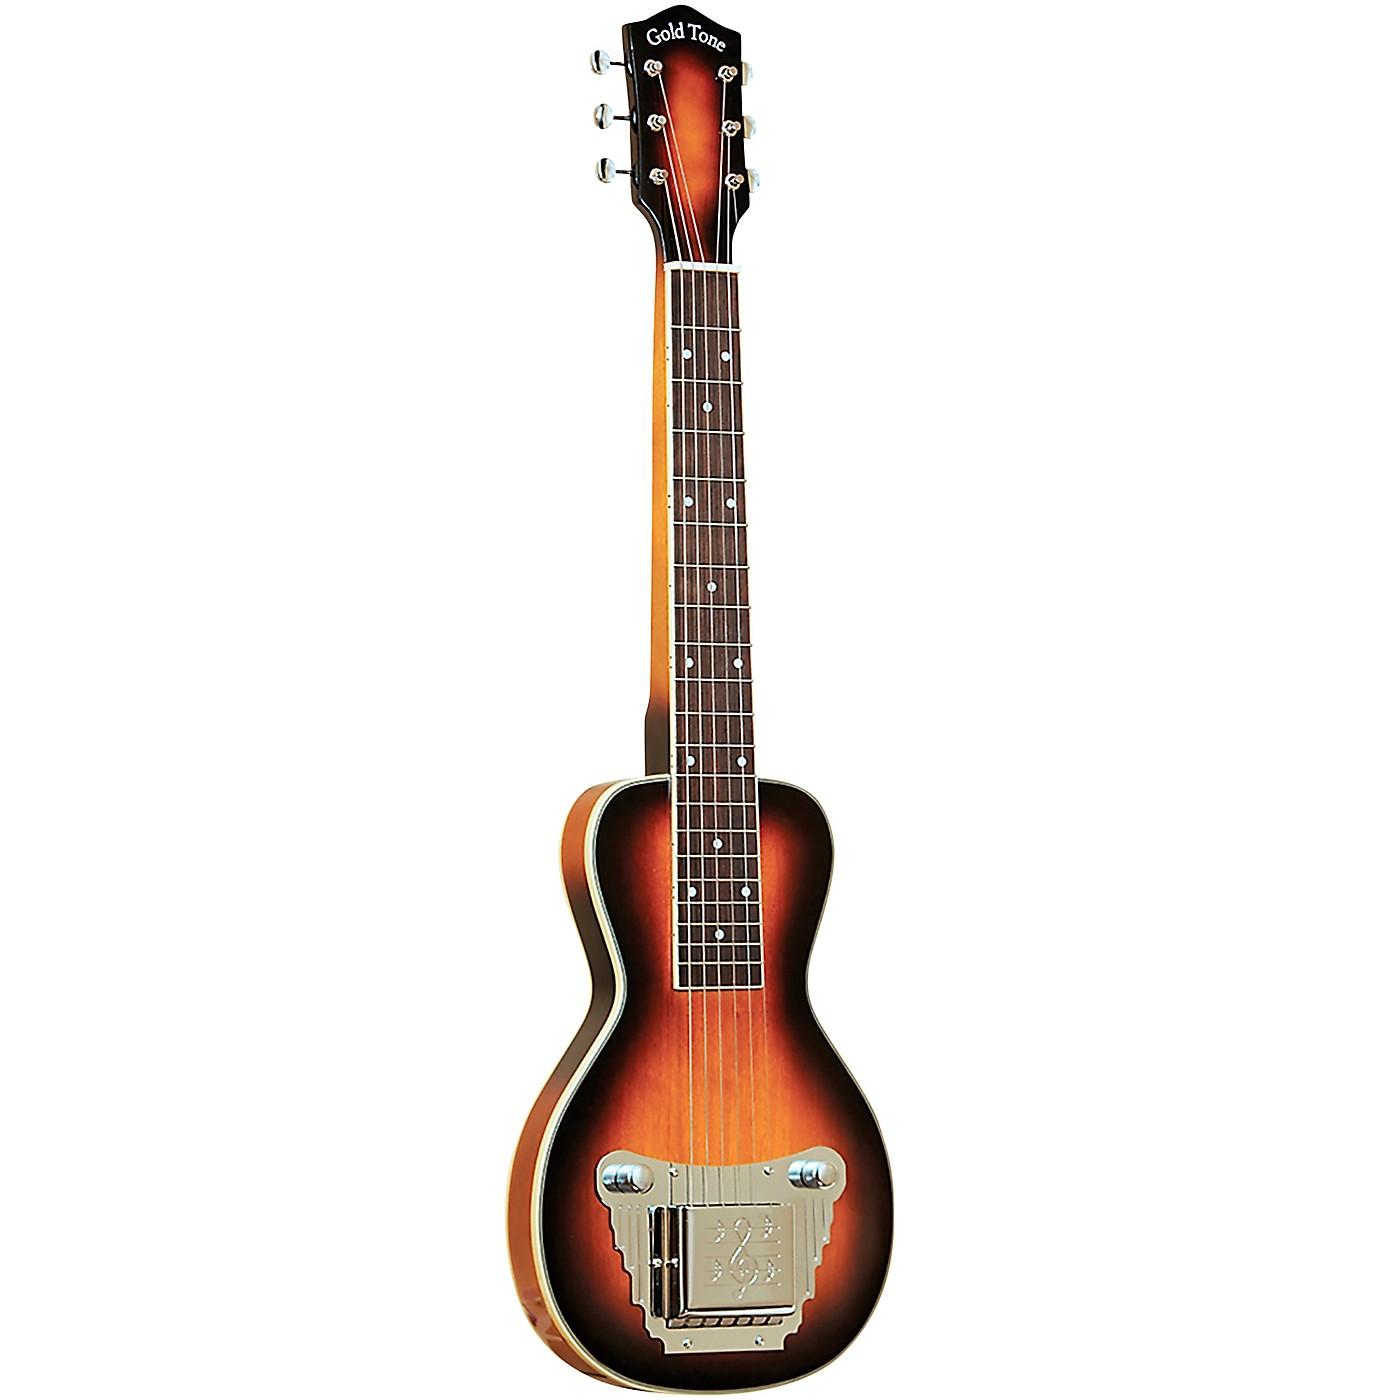 Gold Tone LS-6/L Left-Handed Lap Steel Guitar thumbnail